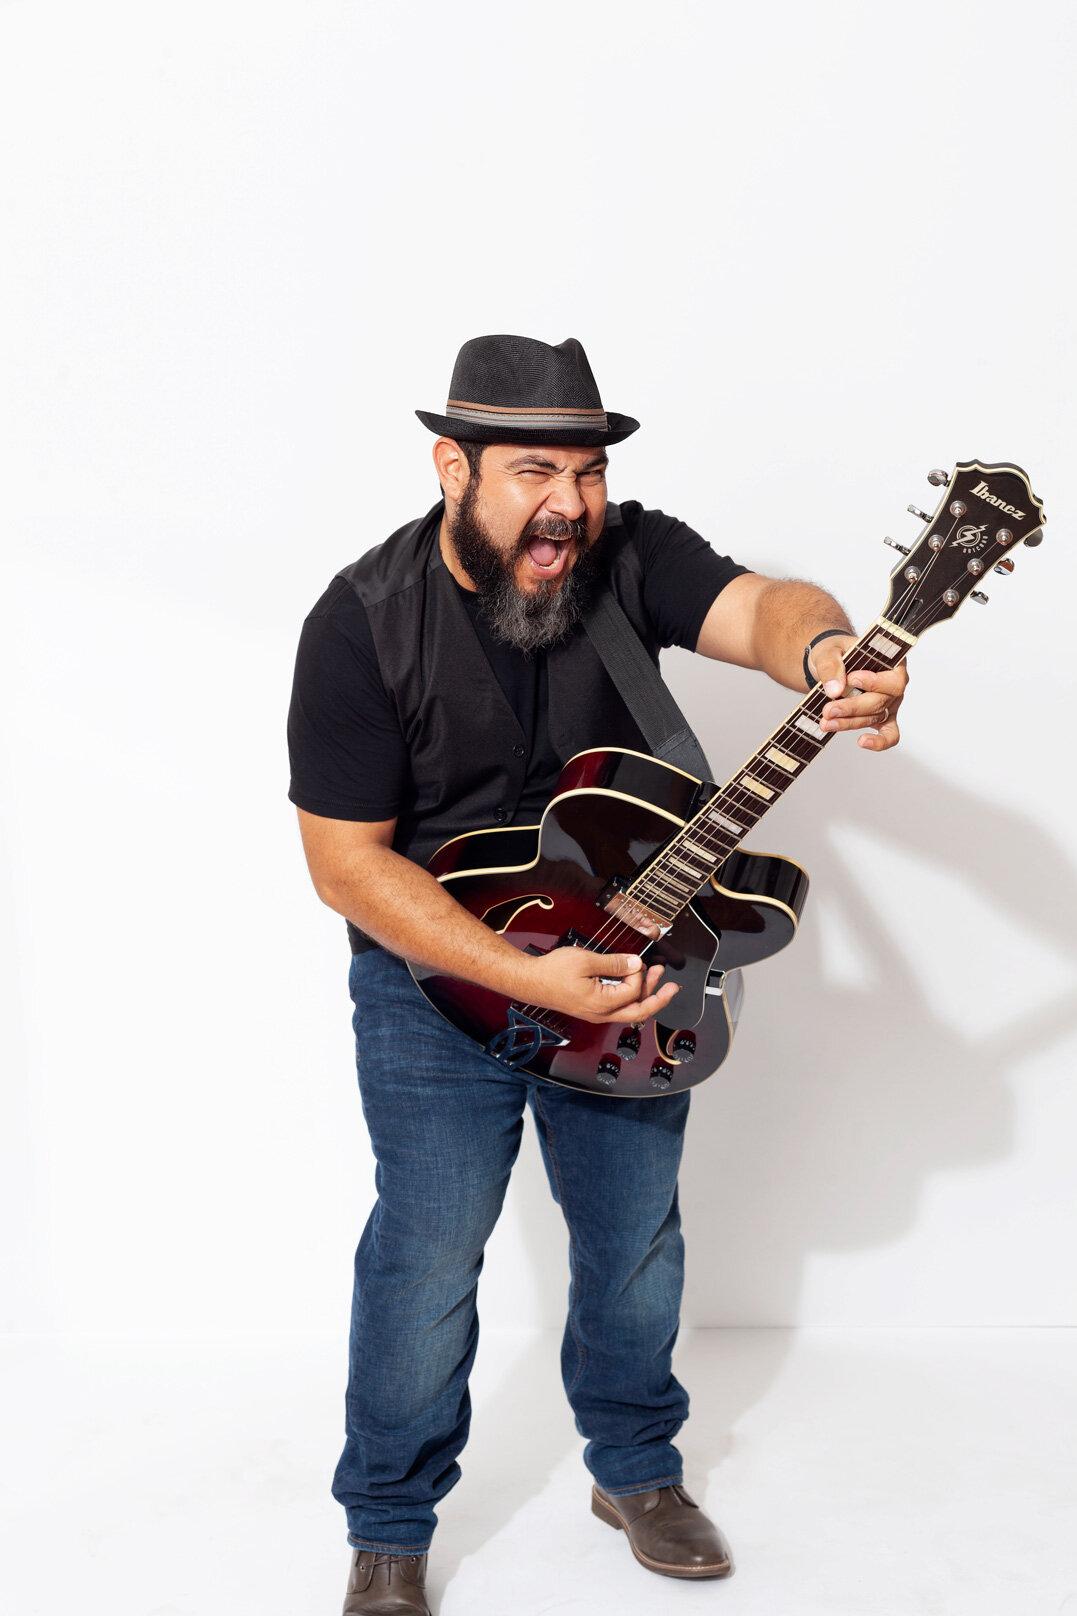 JV Varela - Lead Guitar, Banjo, Mandolin